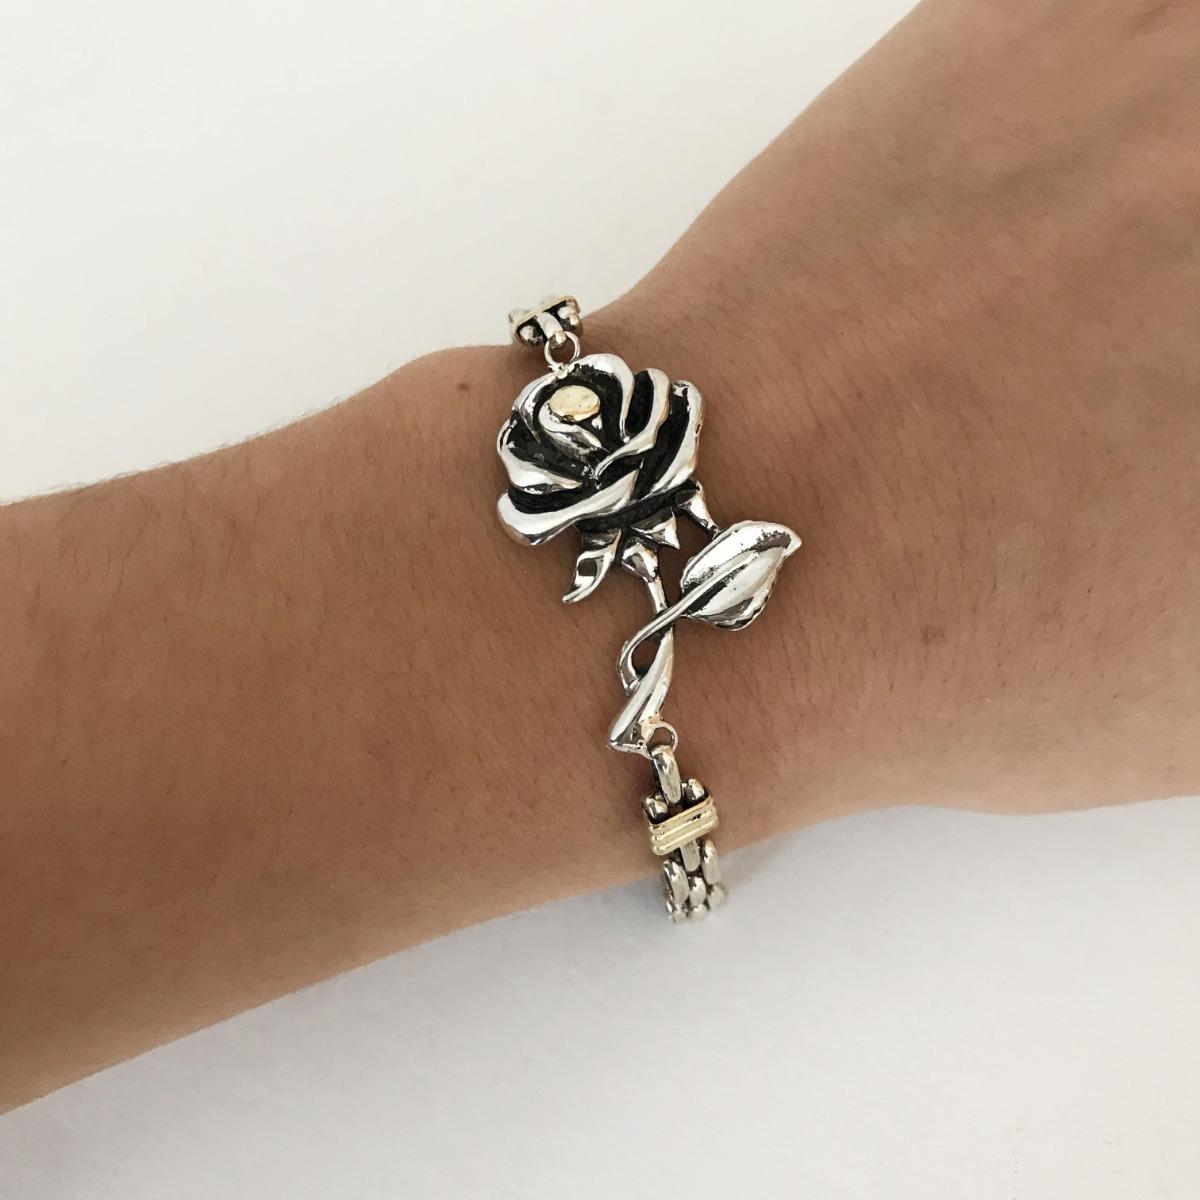 c9e9430b5d70 pulsera plata y oro flor maciza garantía escrita regalo. Cargando zoom.